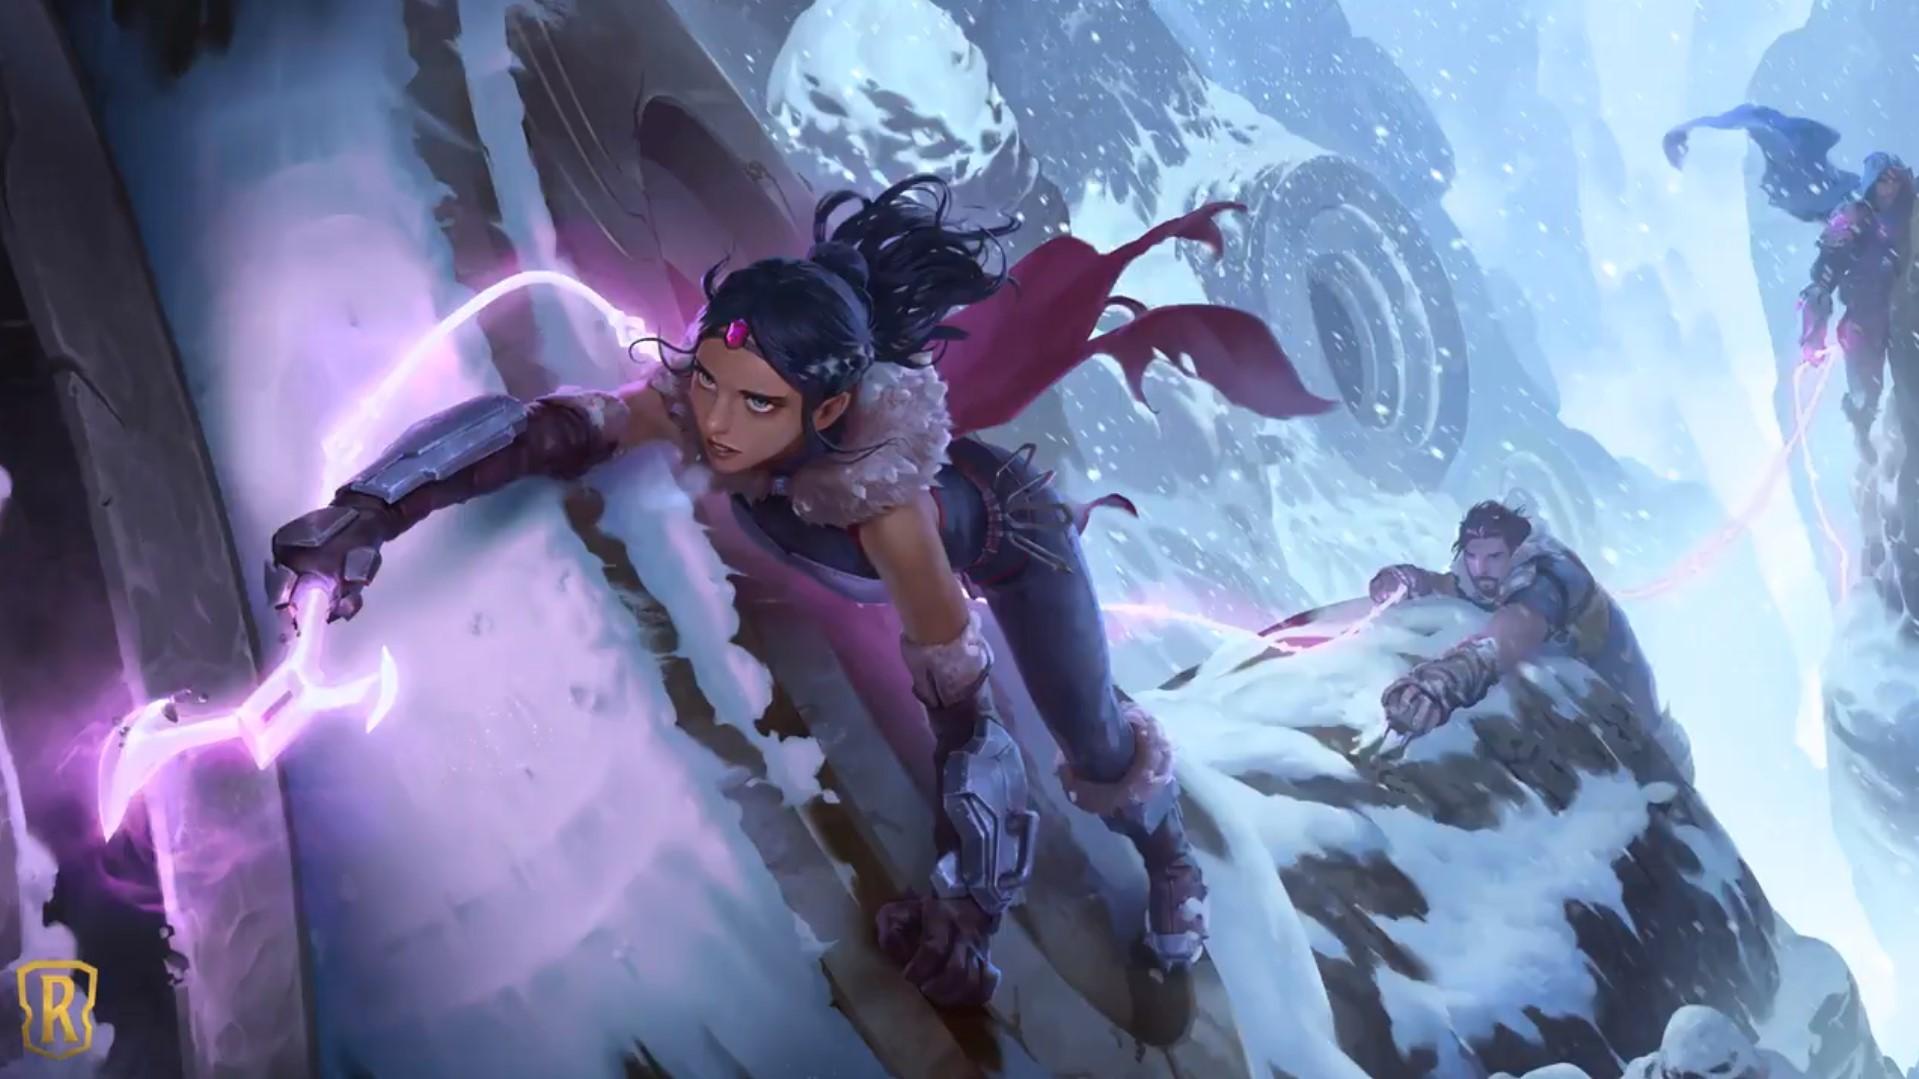 New Legends of Runeterra Card Impressions: Spellshield Keyword, Bastion, and More